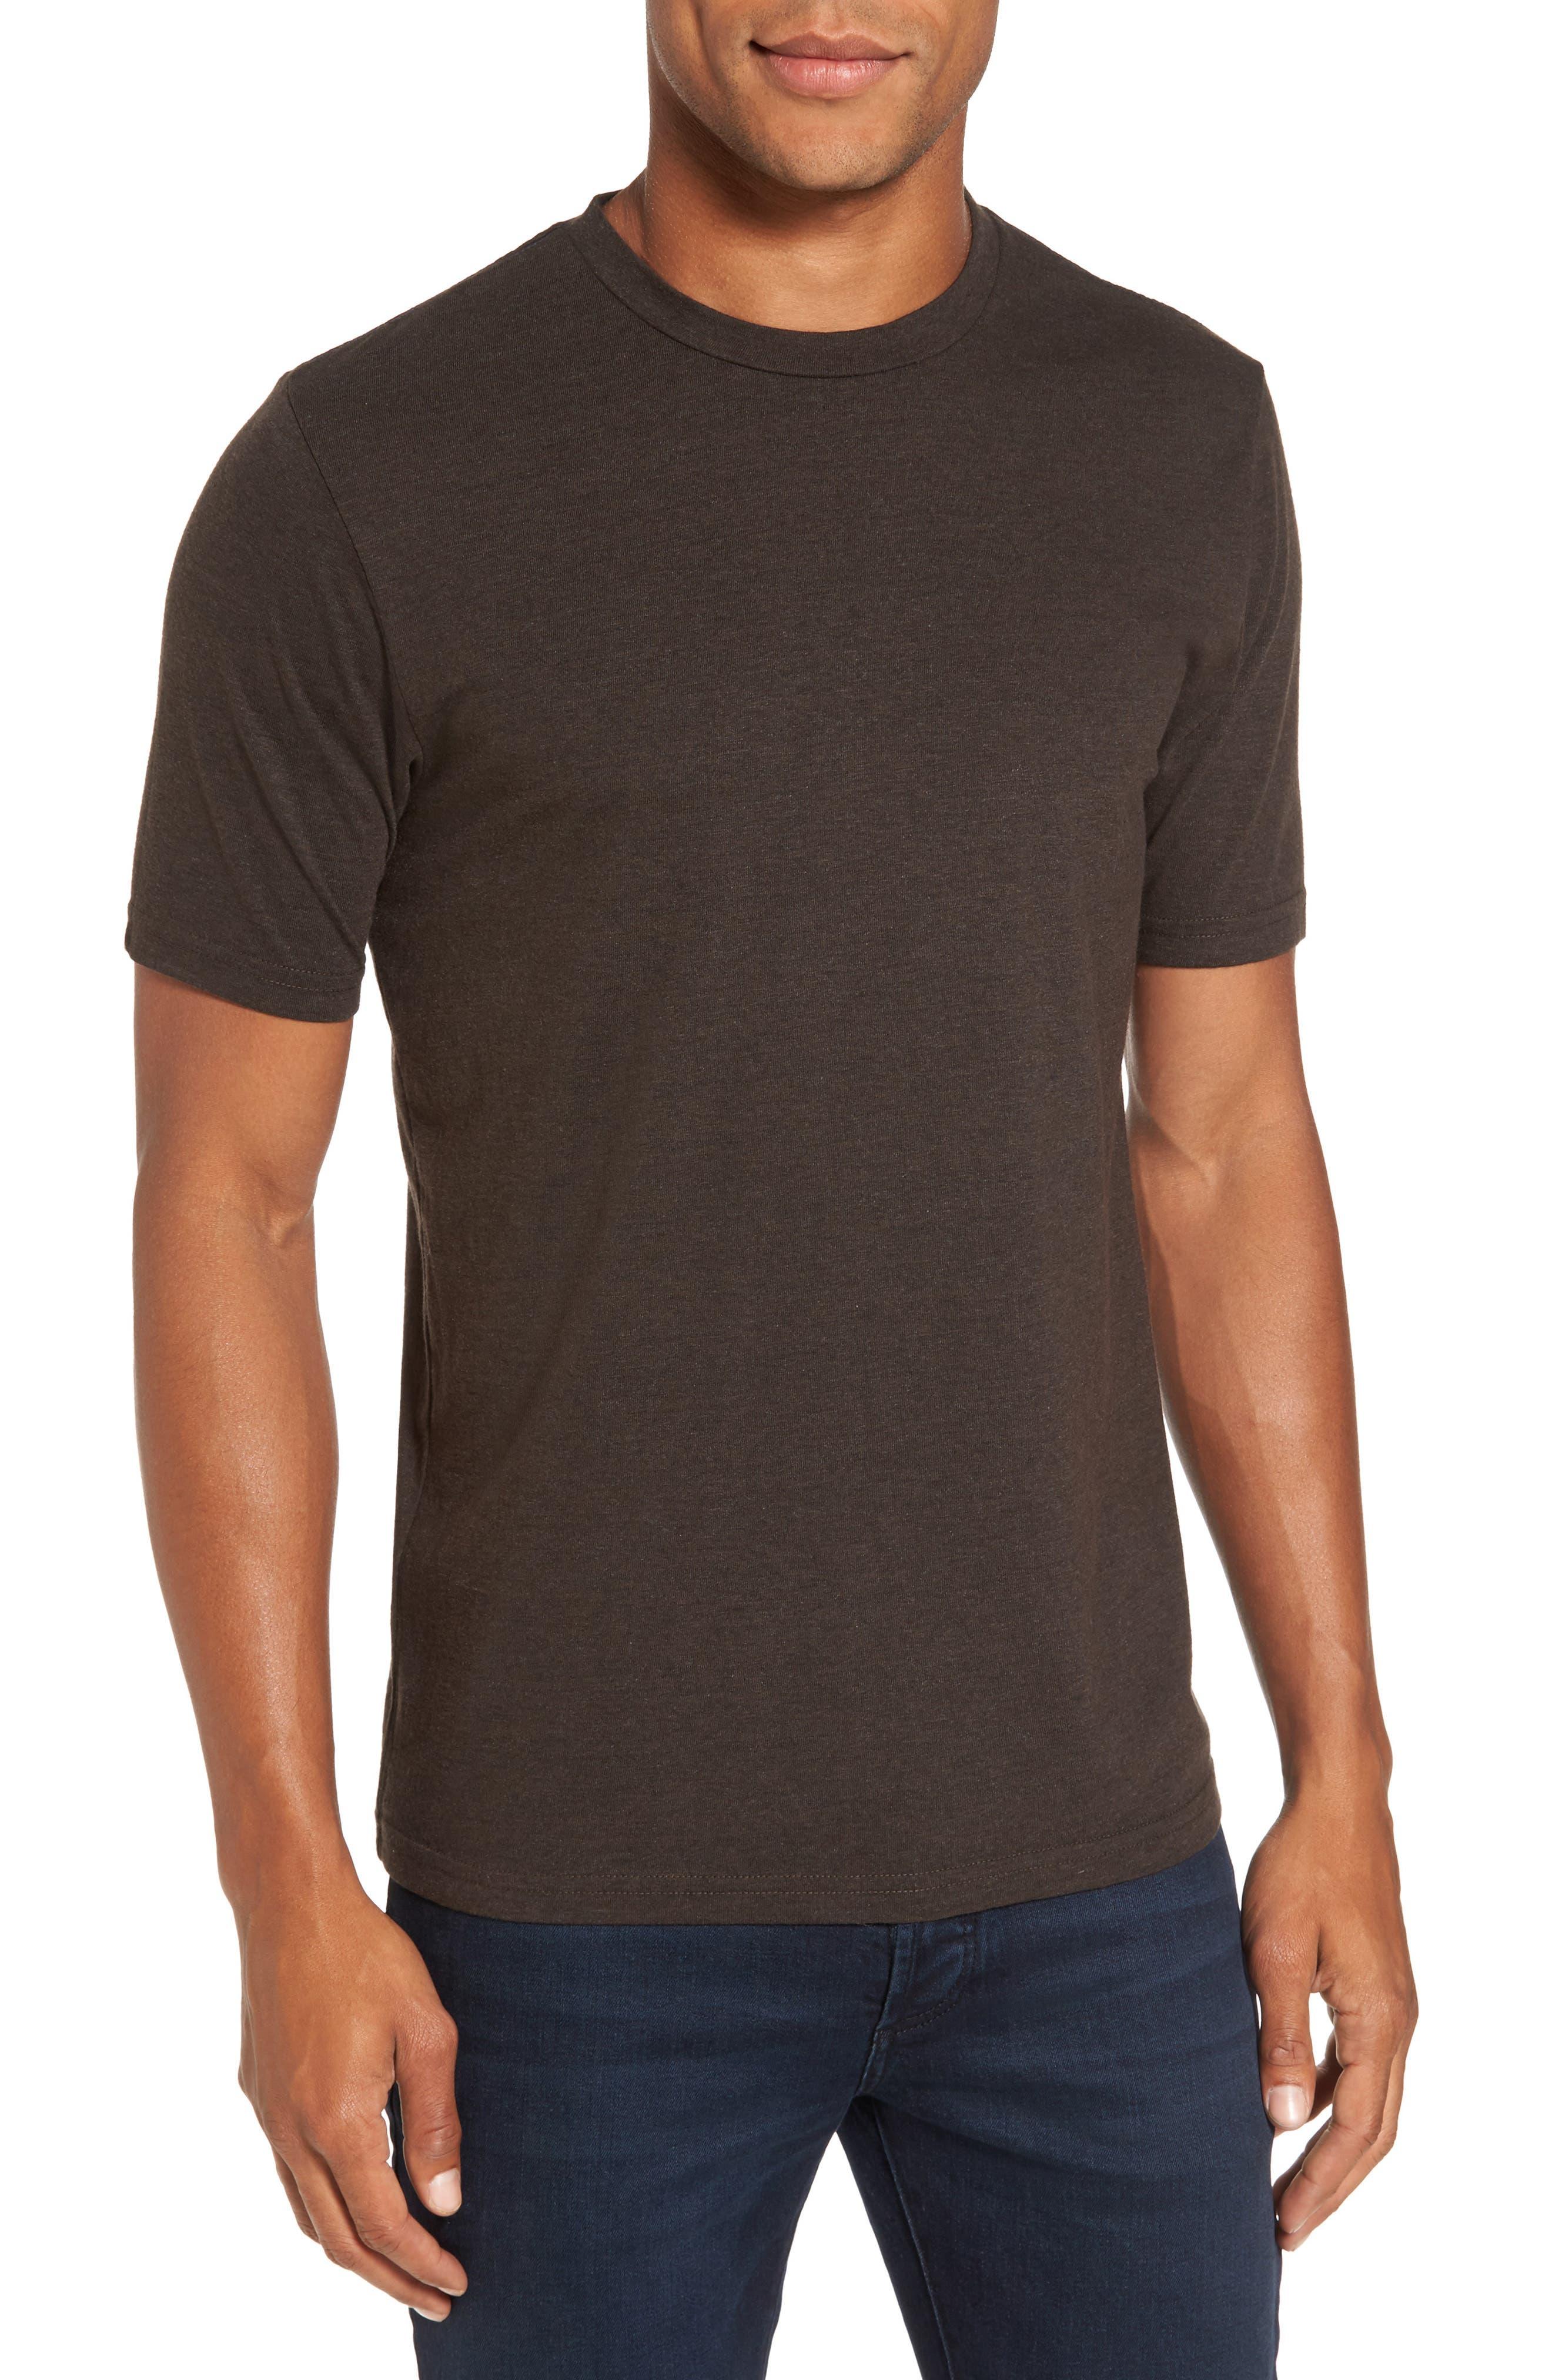 Alternate Image 1 Selected - Goodlife Crewneck Heathered T-Shirt